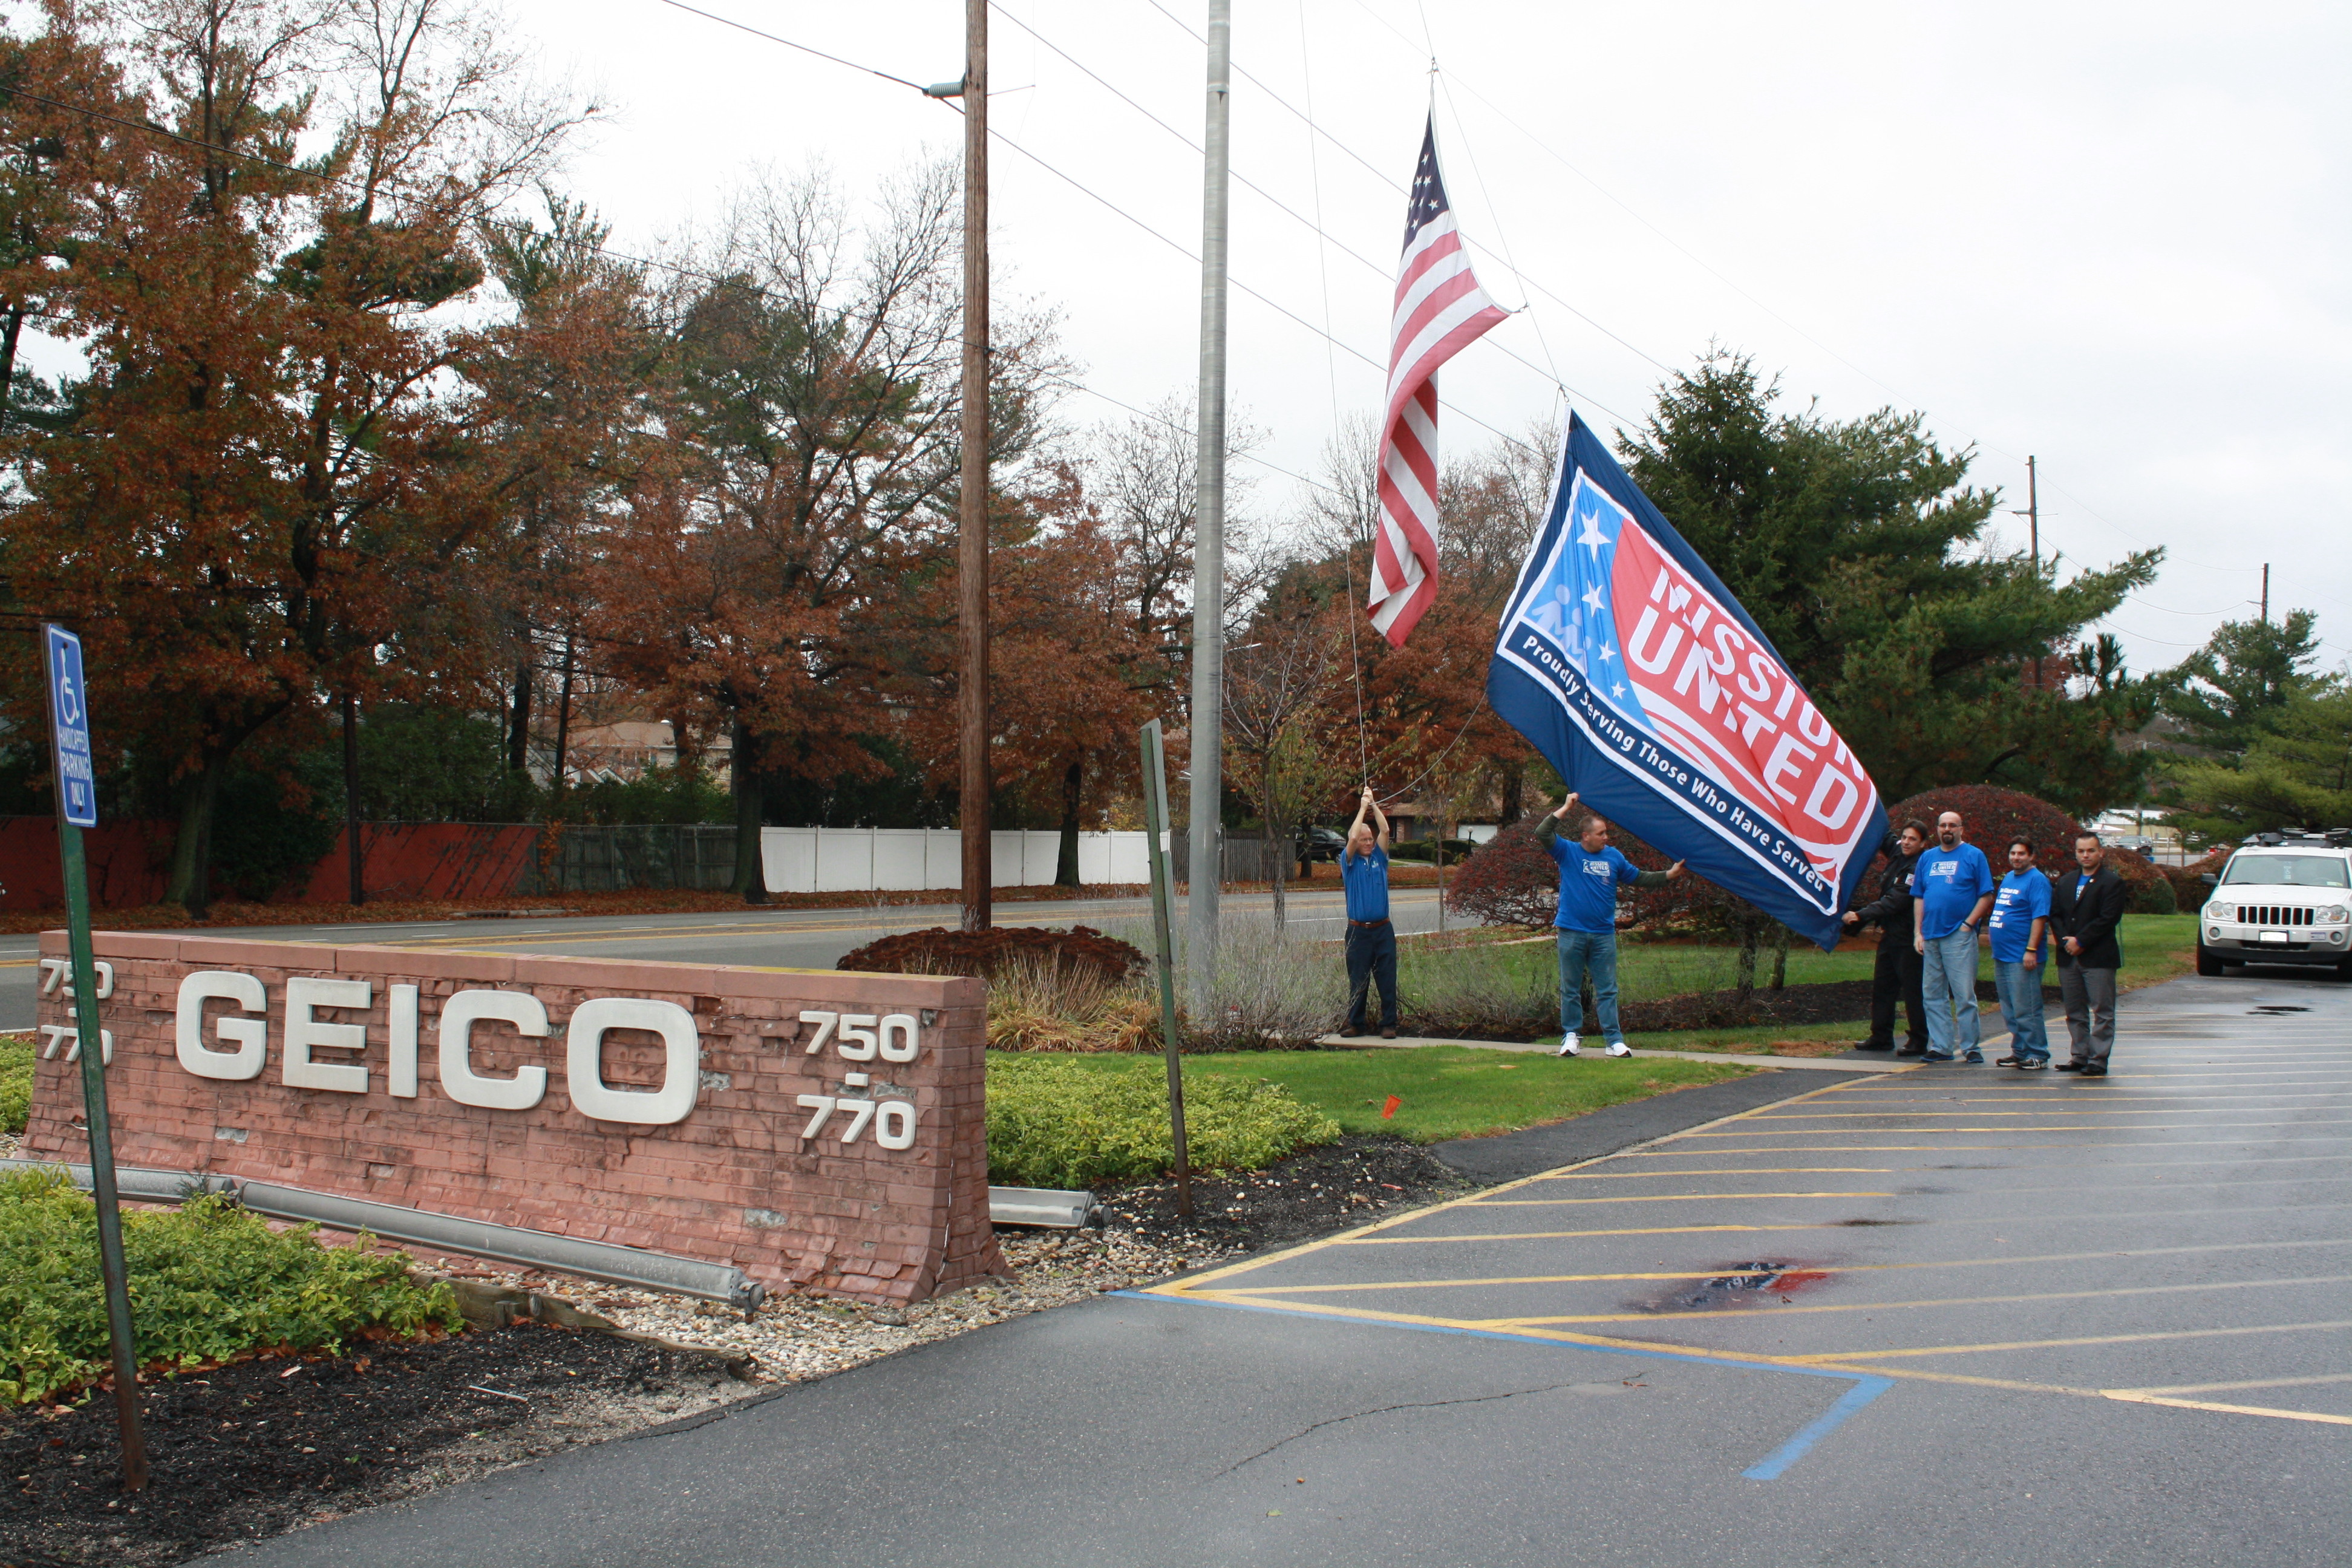 Geico – United Way of Long Island Blog